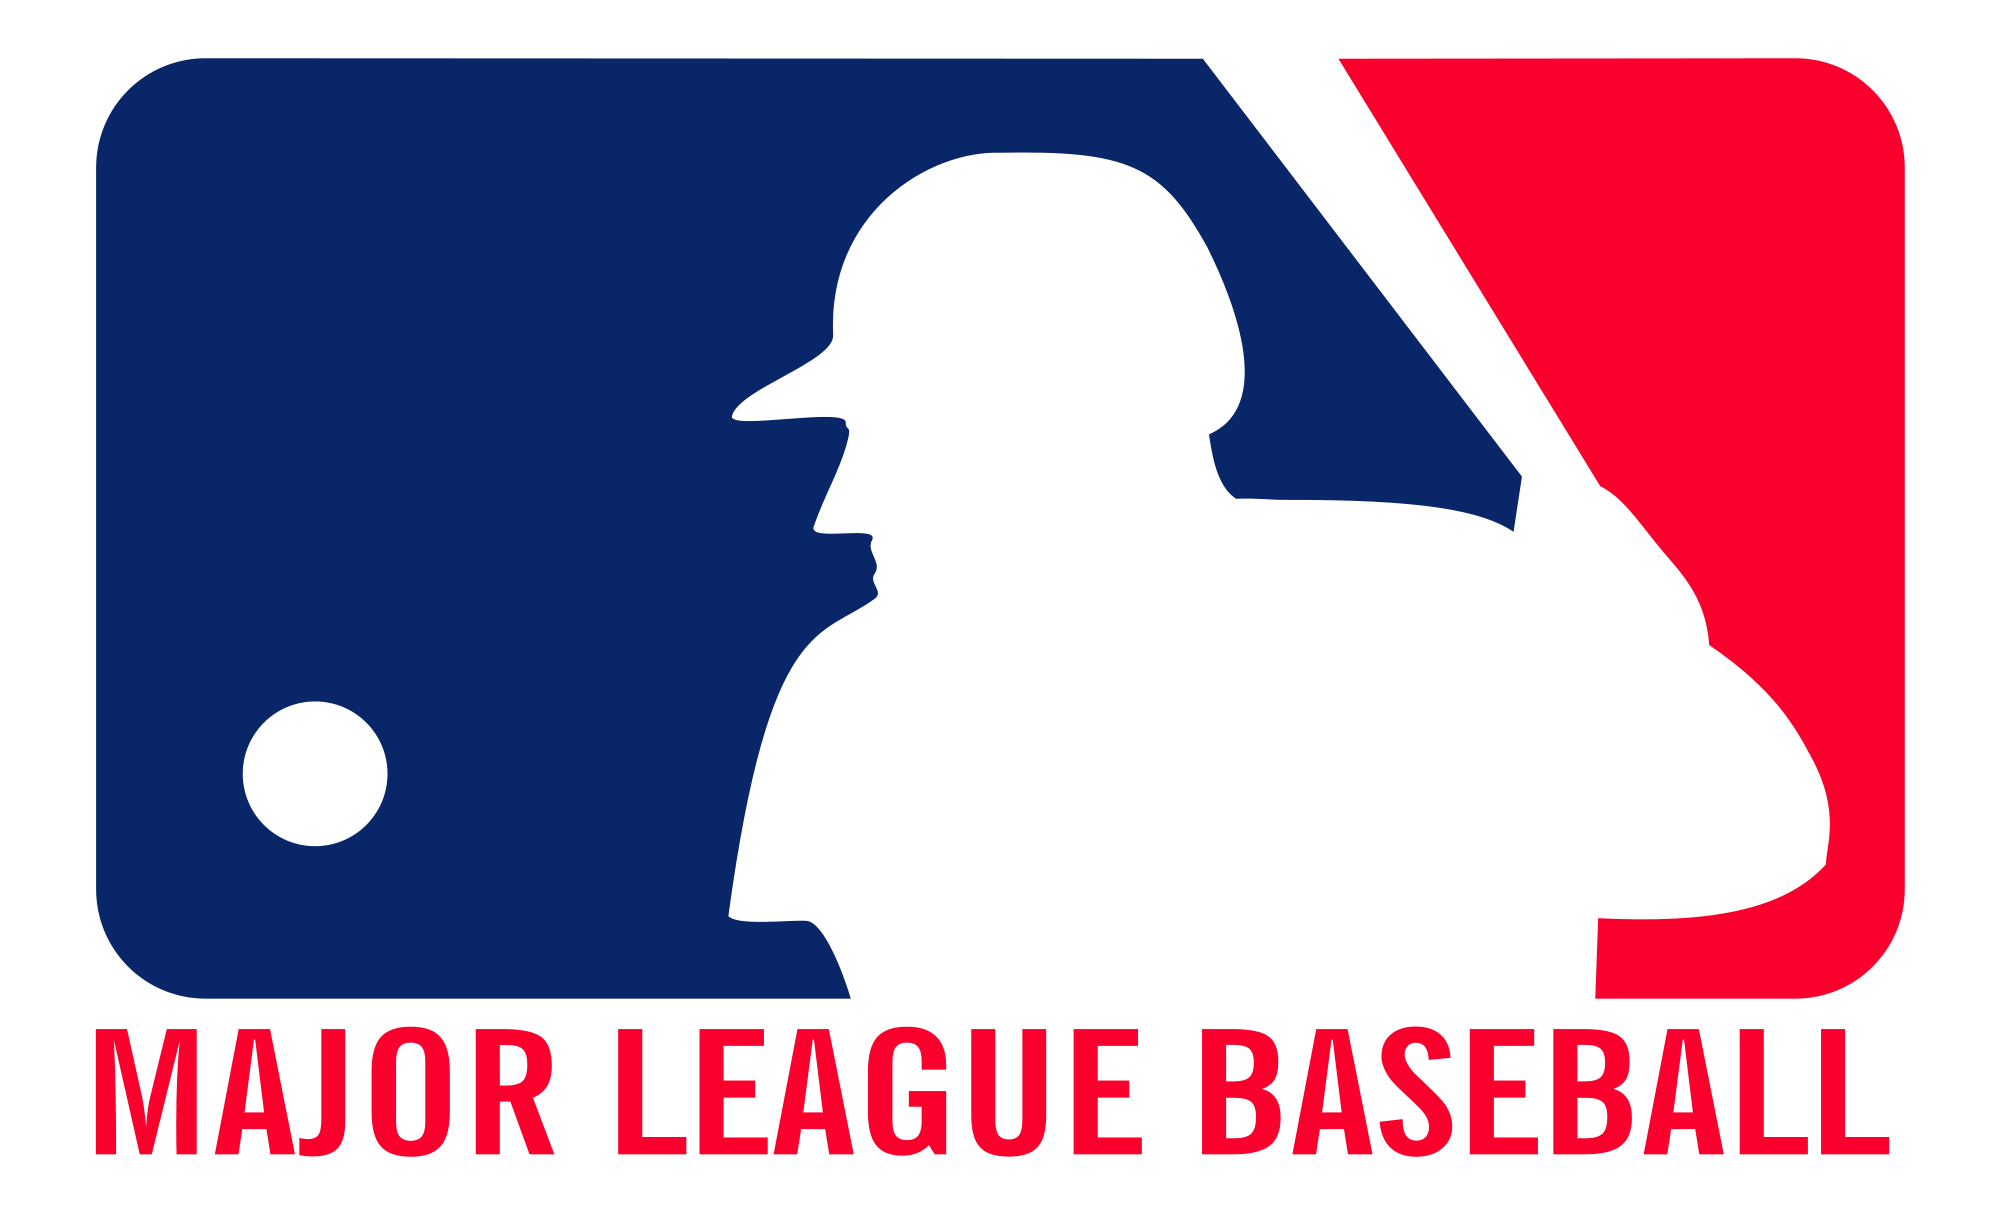 download-major-league-baseball-logo.png